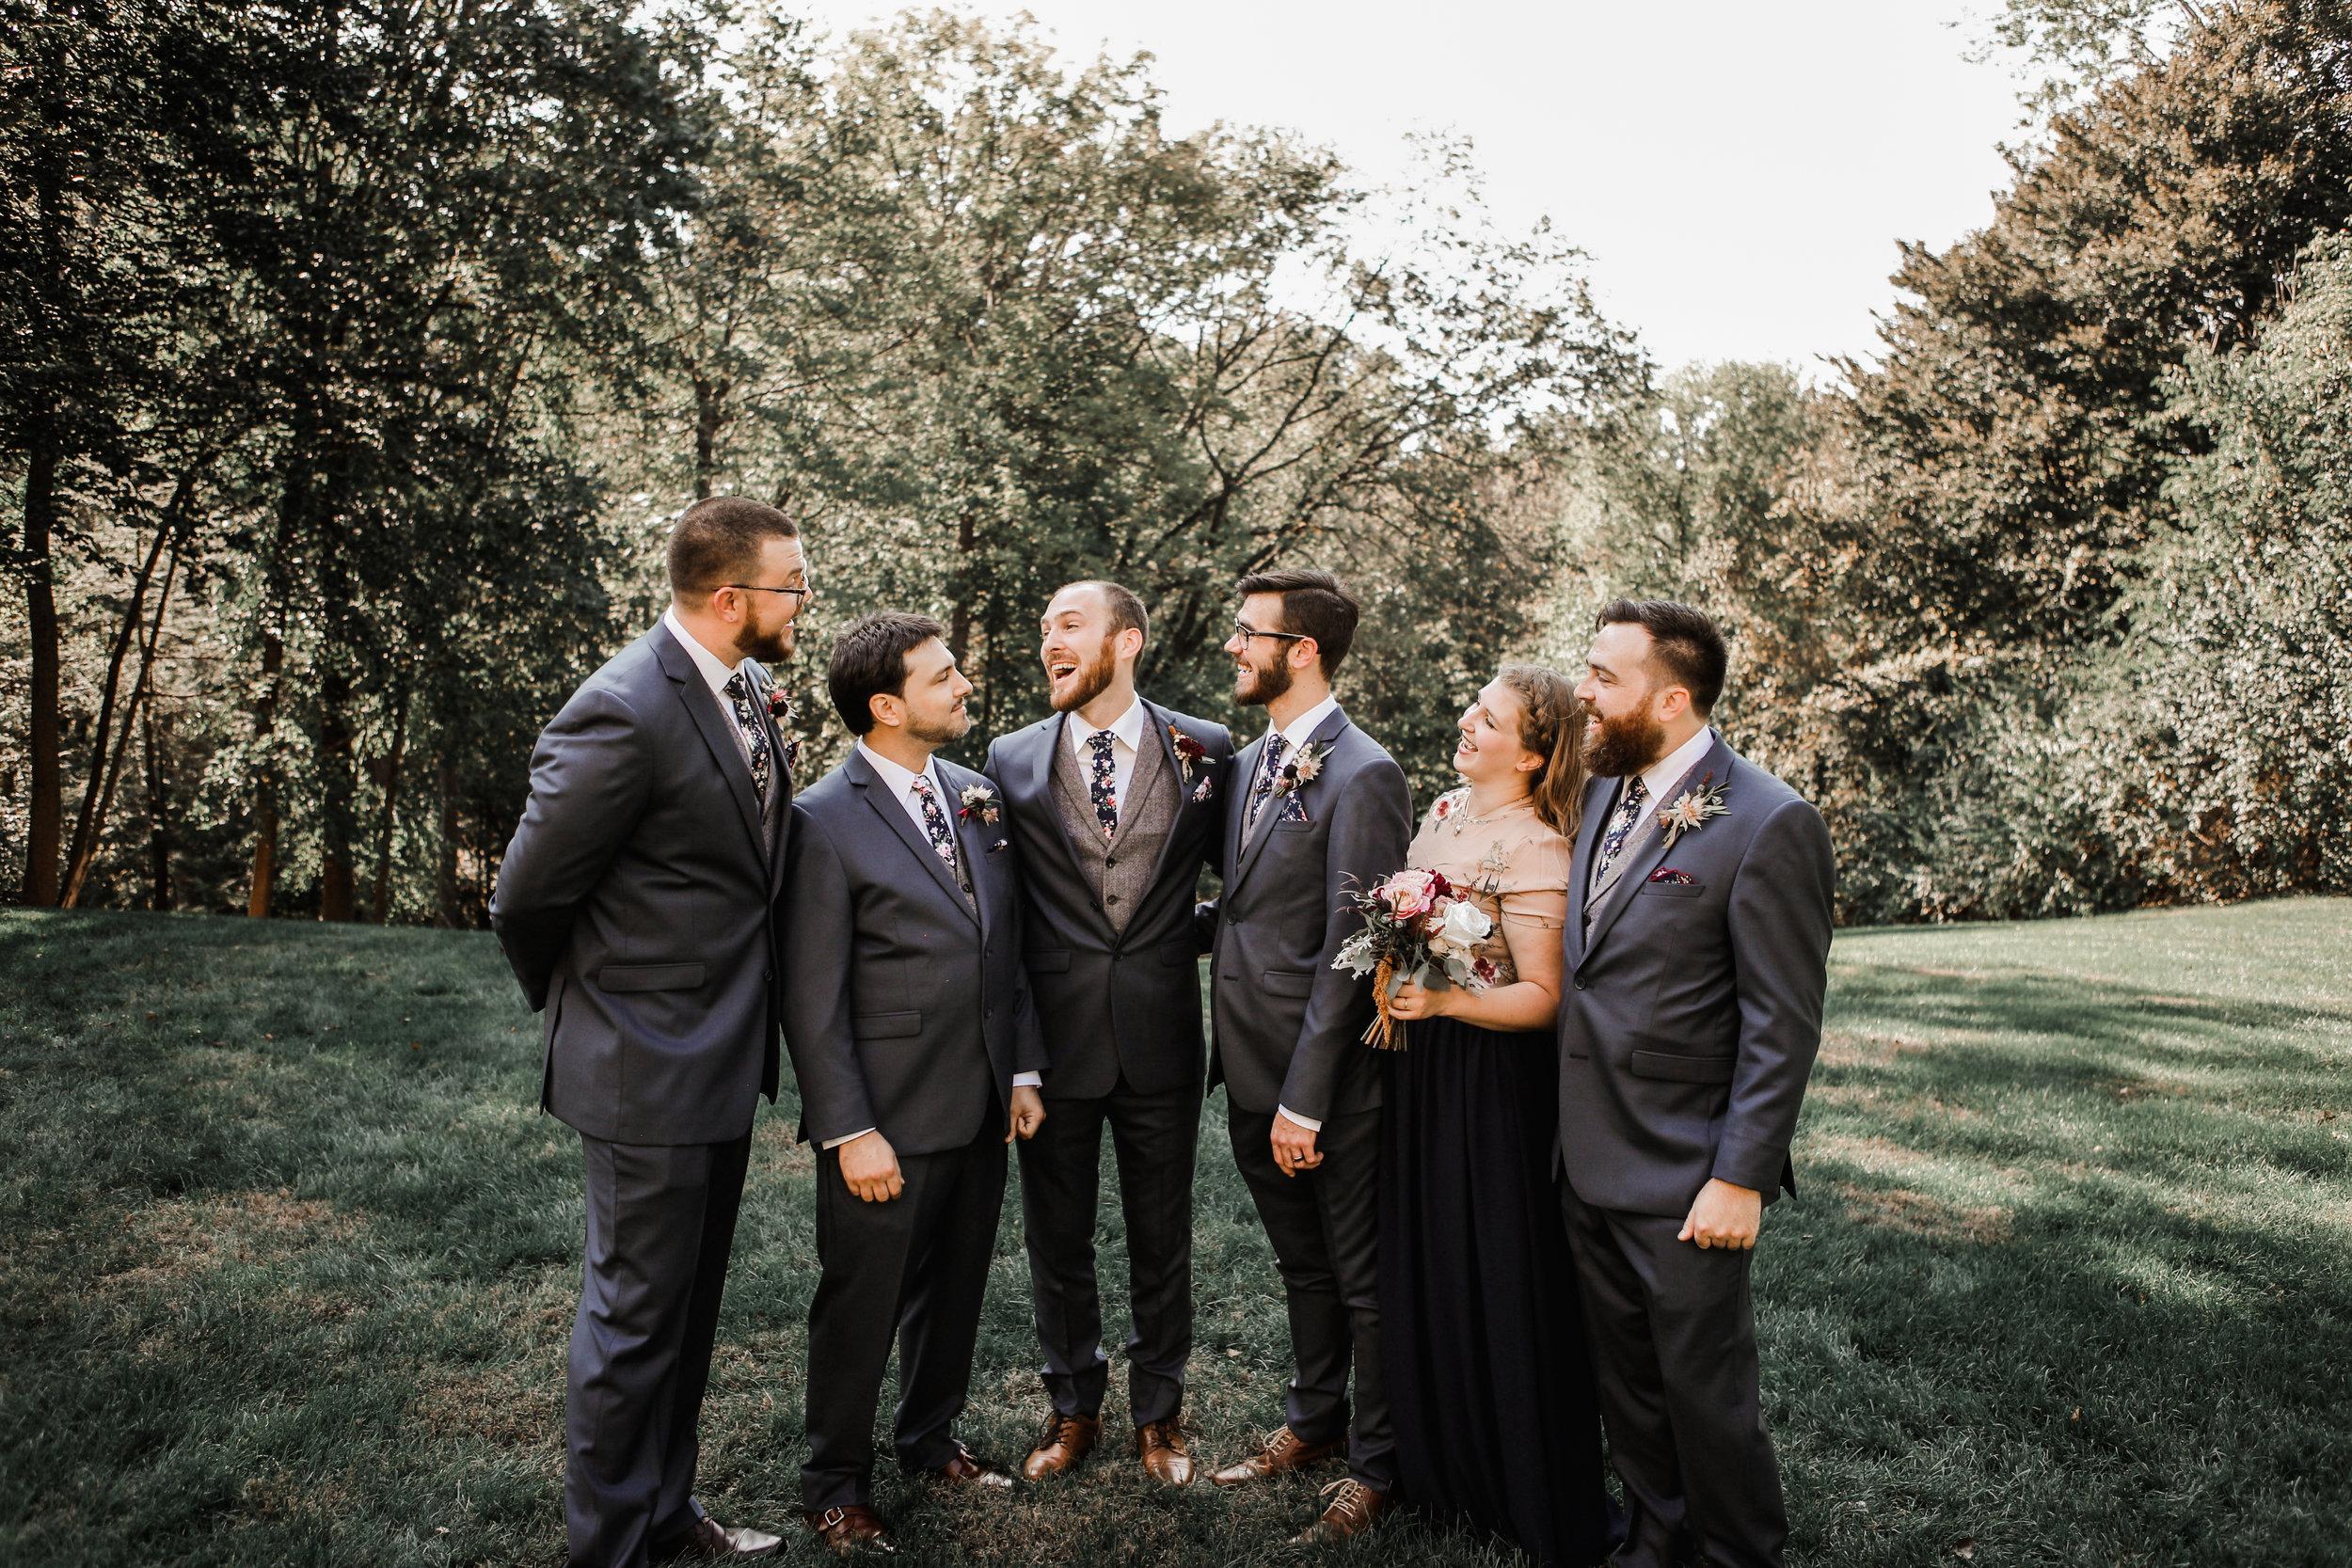 LDP_McNeiveWedding_WeddingParty_011.JPG